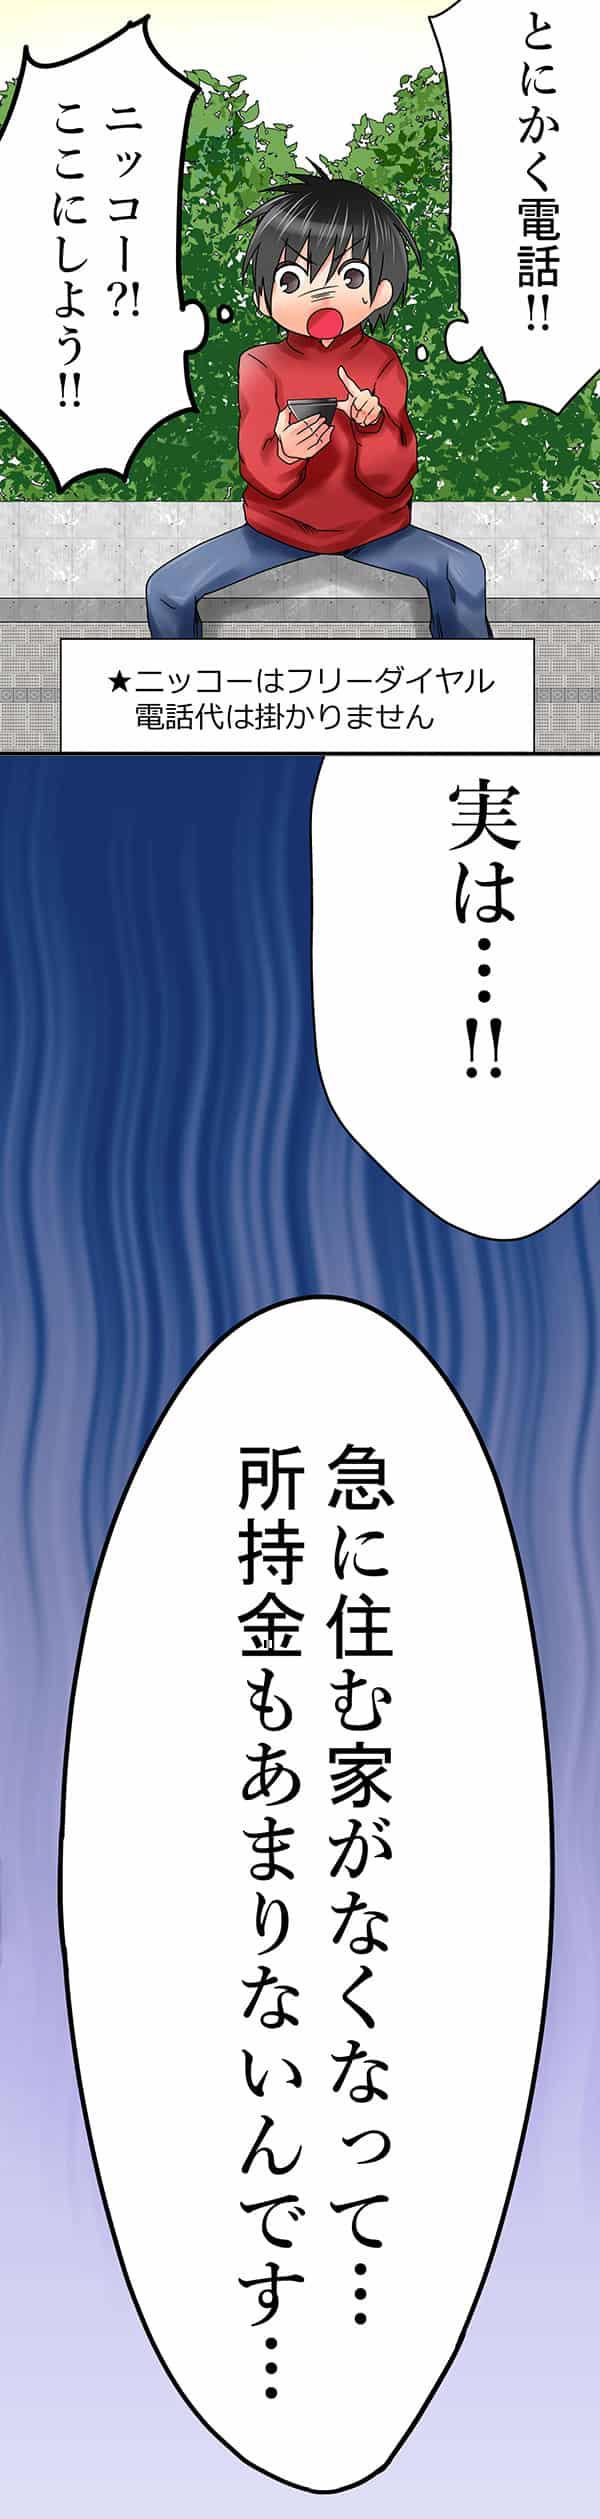 nikko_cm04A.jpg